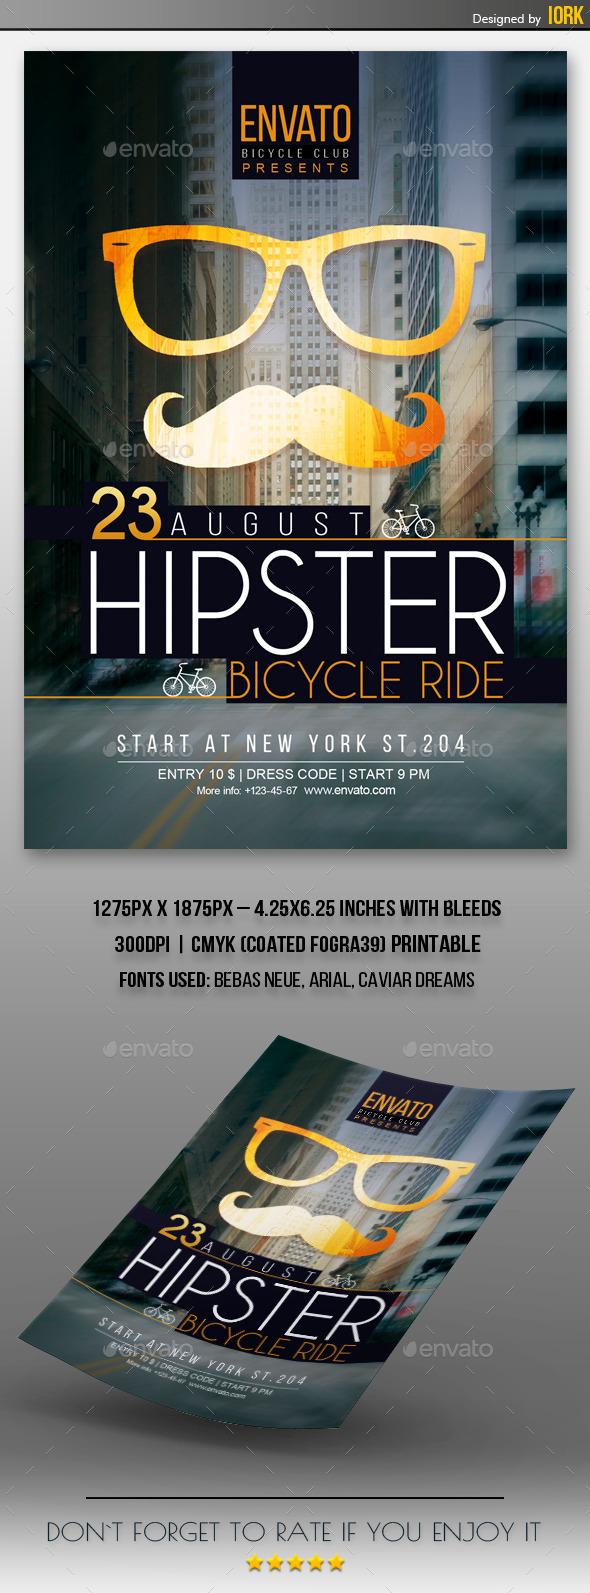 Hipster Event Flyer